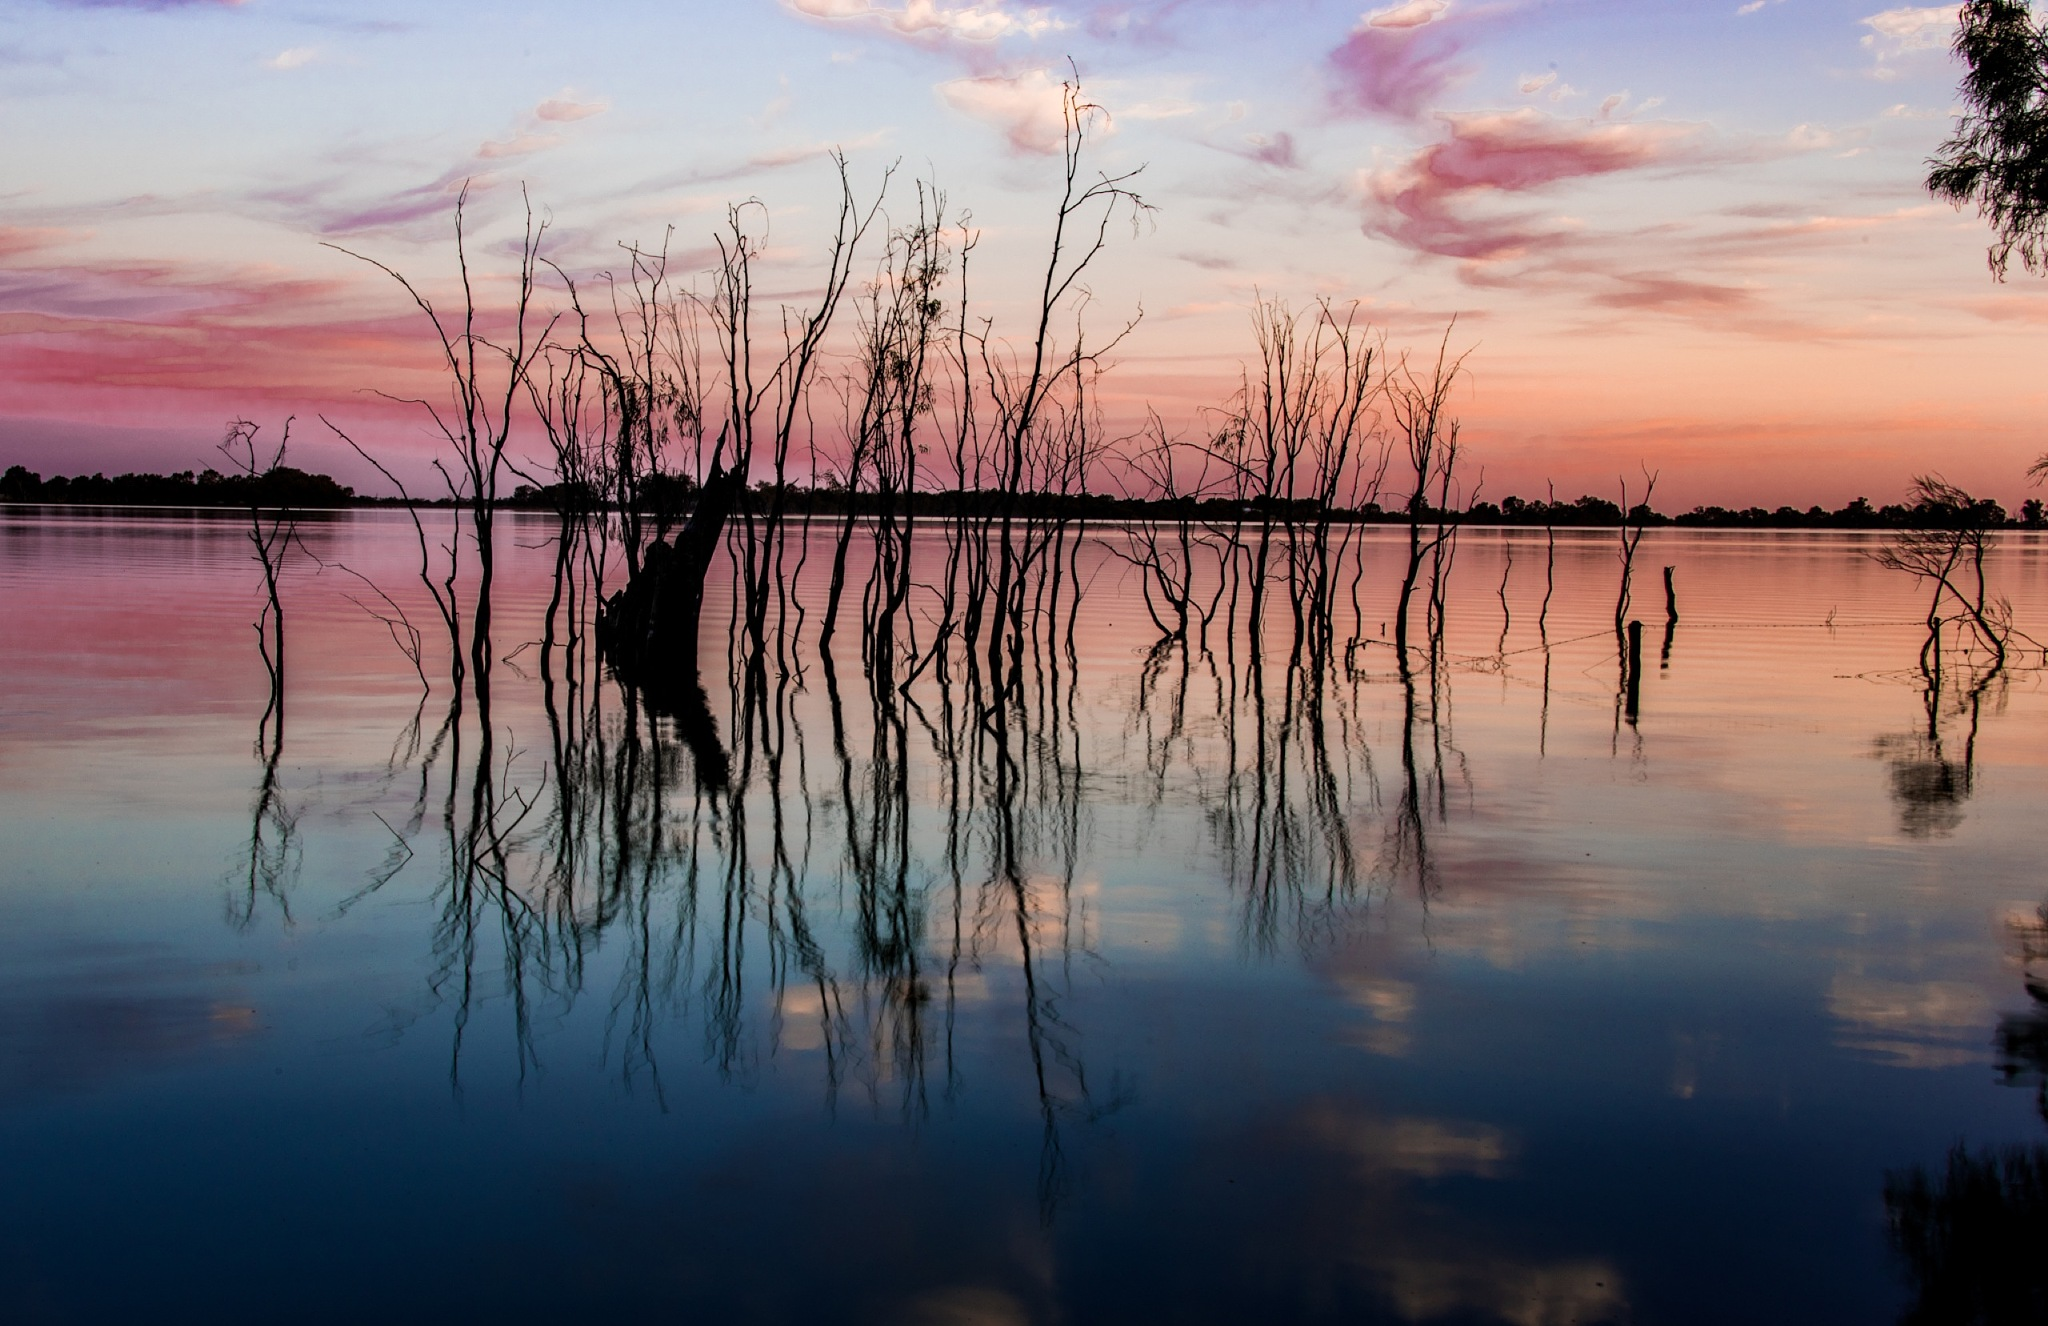 Lake Cargellico sunset by Trevor McKinnon